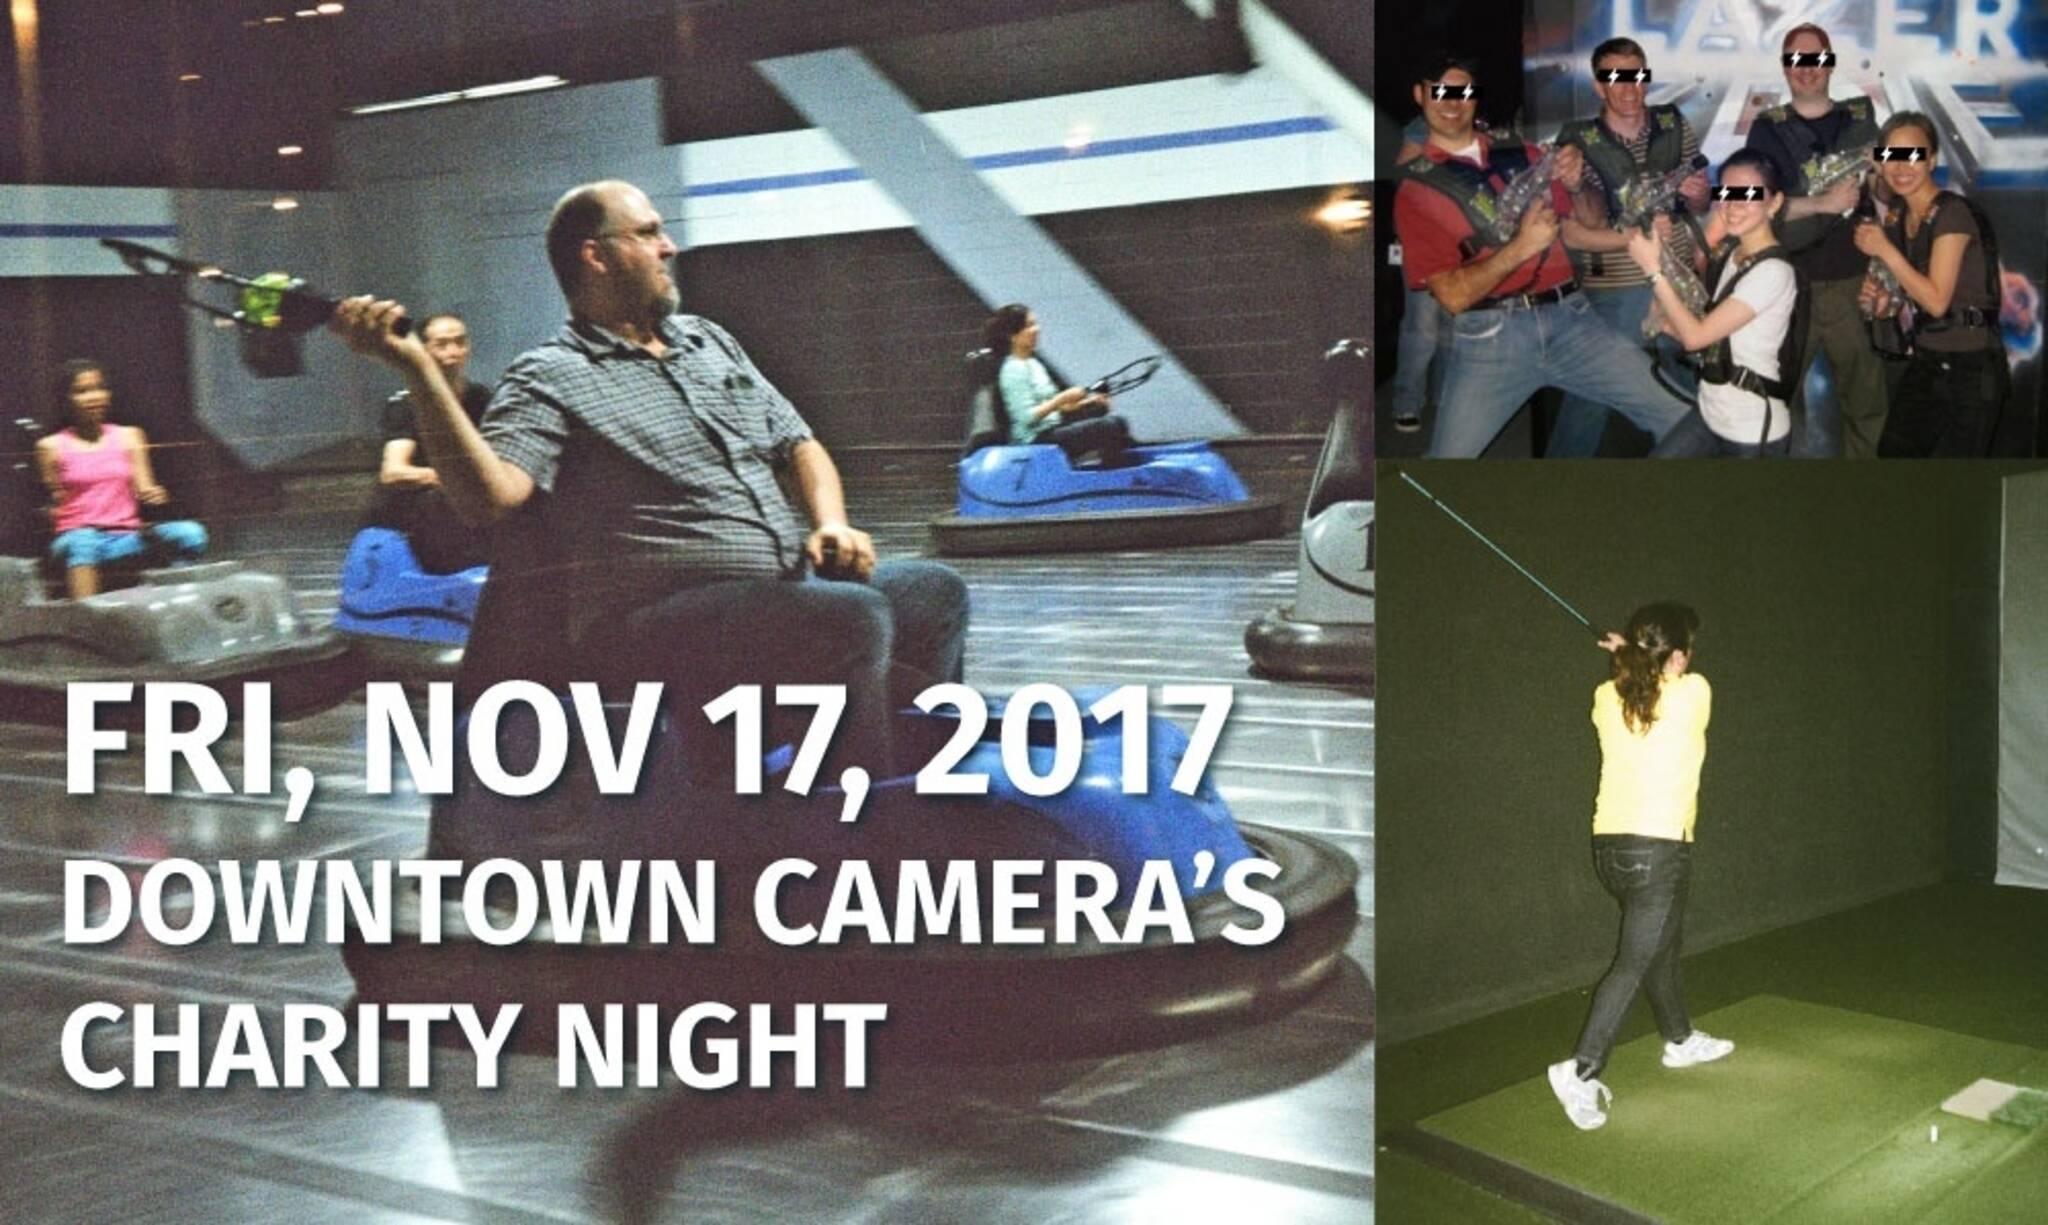 Downtown Camera's Charity Night - Nov 17-17